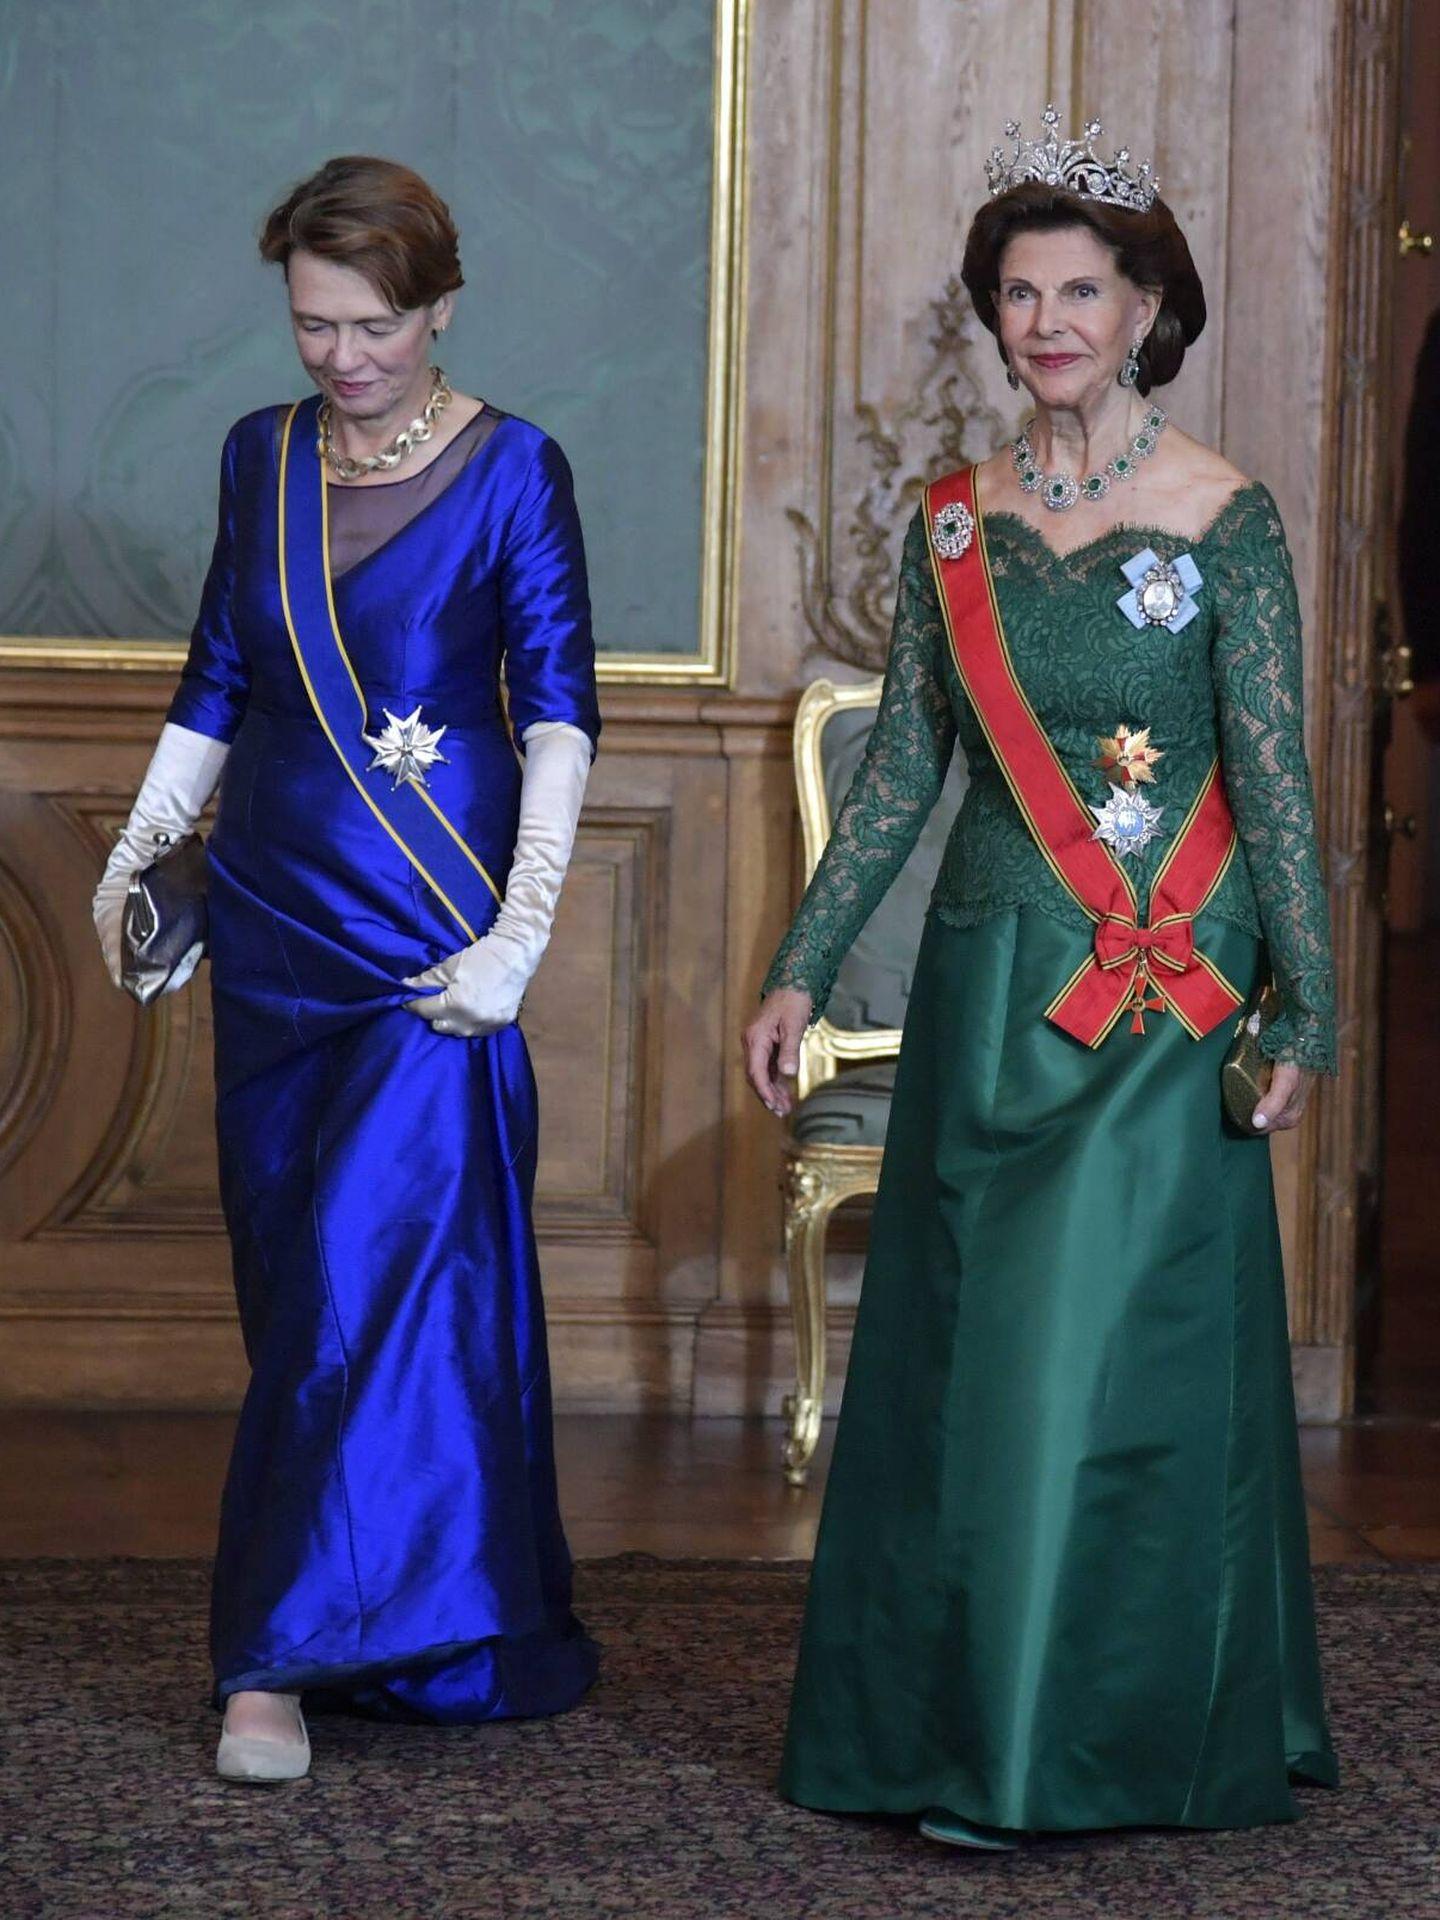 La reina Silvia, junto a la esposa del presidente alemán. (Cordon Press)